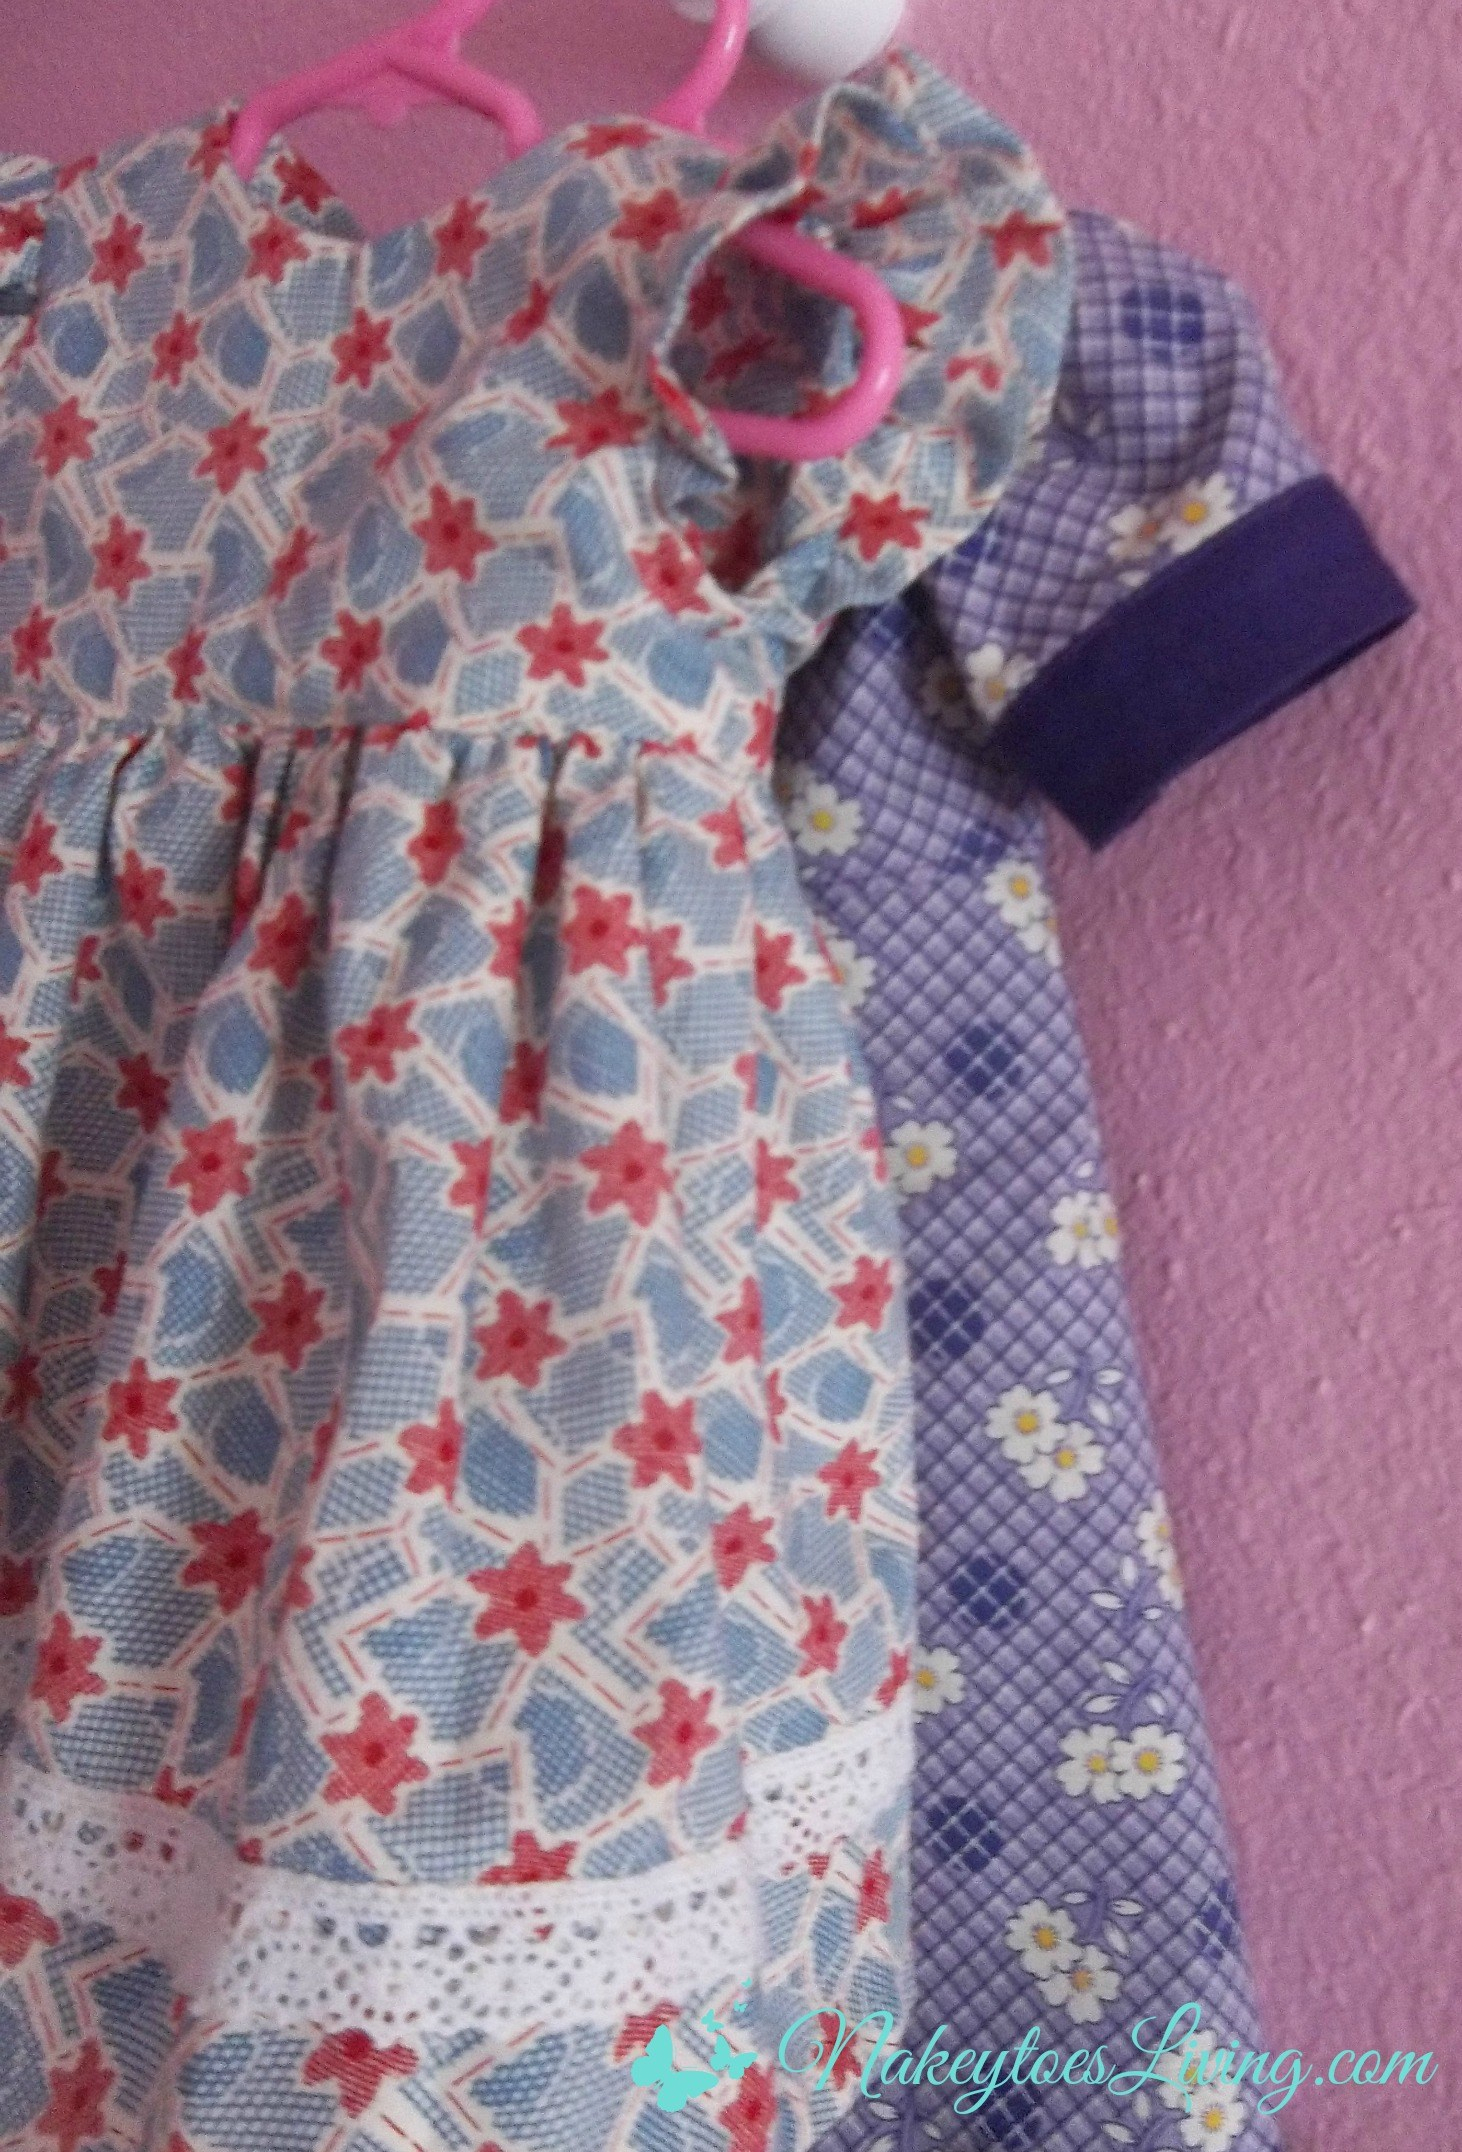 "20 Free 18"" Doll Clothes Patterns - Nakeytoes Living - Free Printable Doll Clothes Patterns For 18 Inch Dolls"